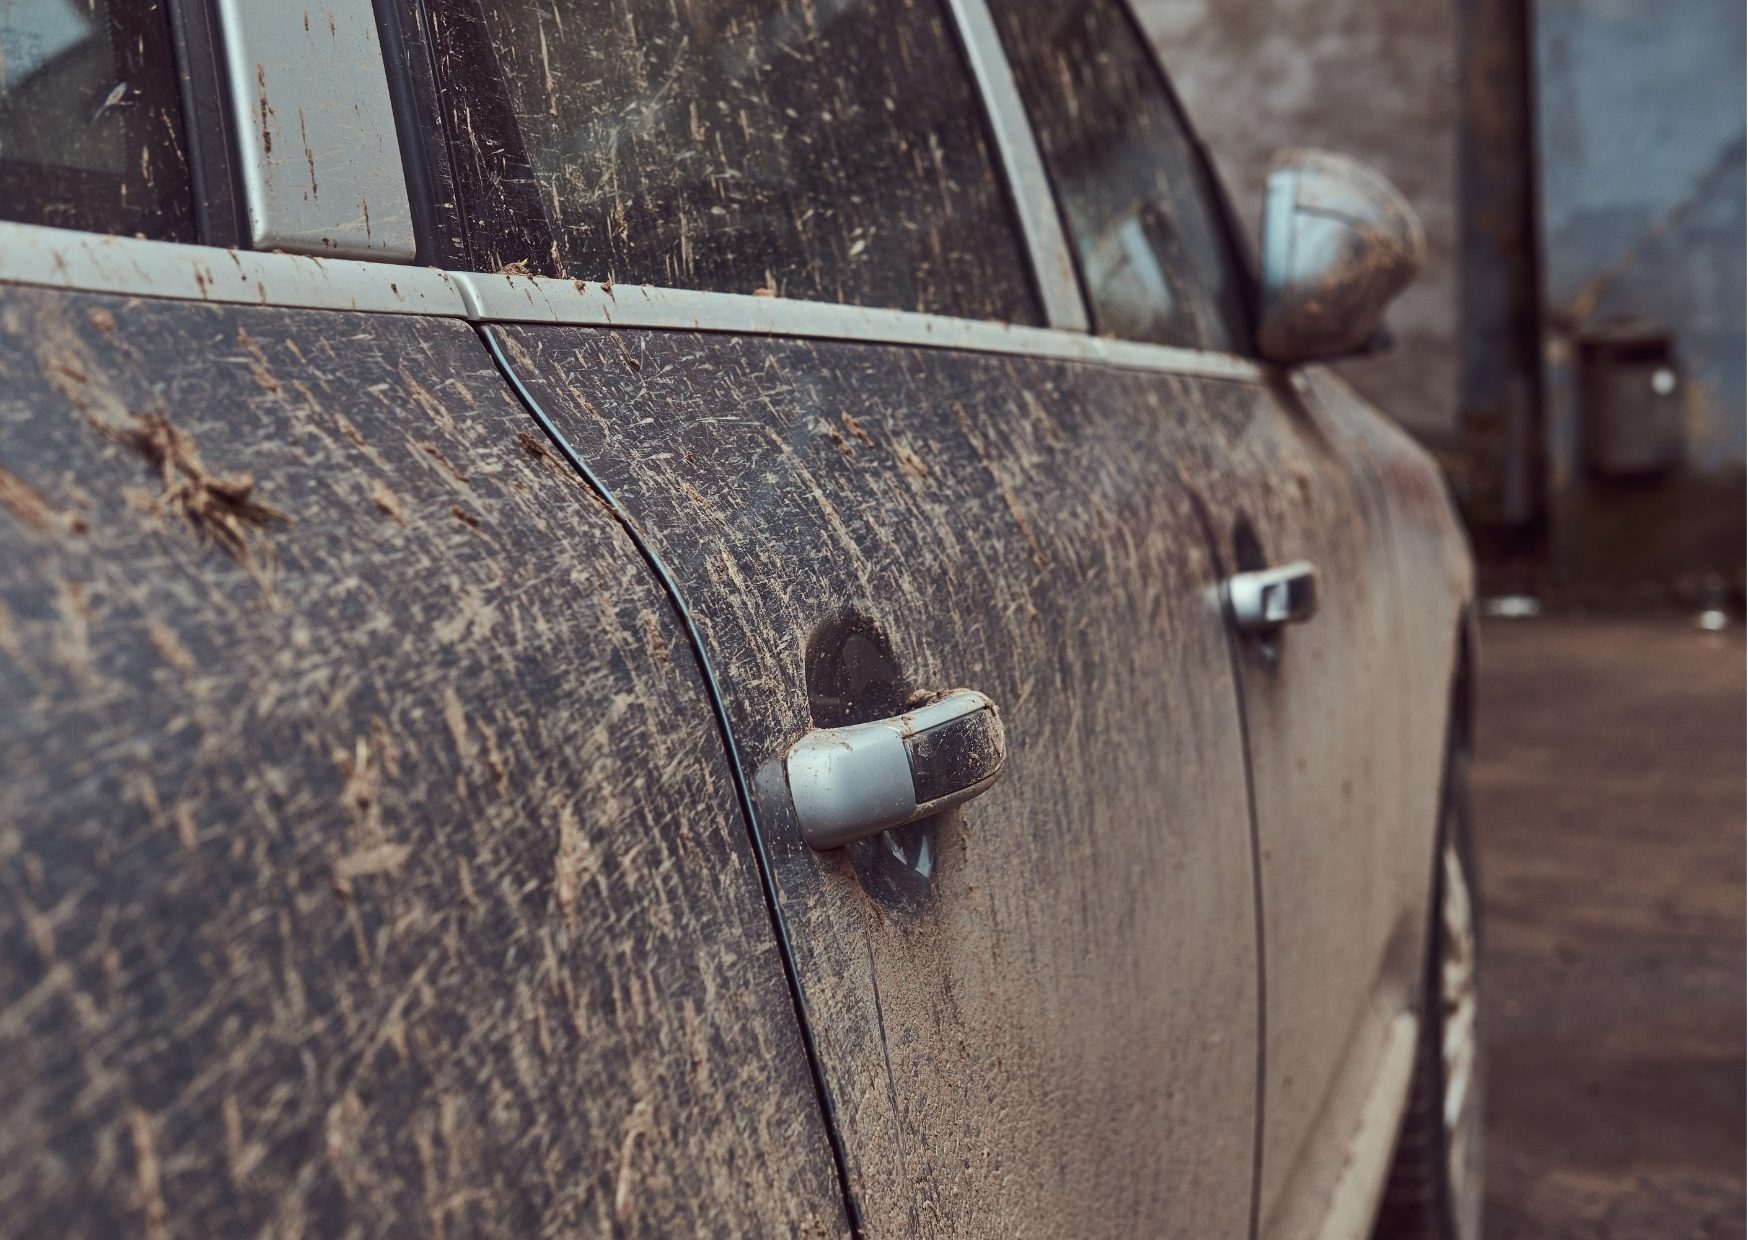 špinavé auto